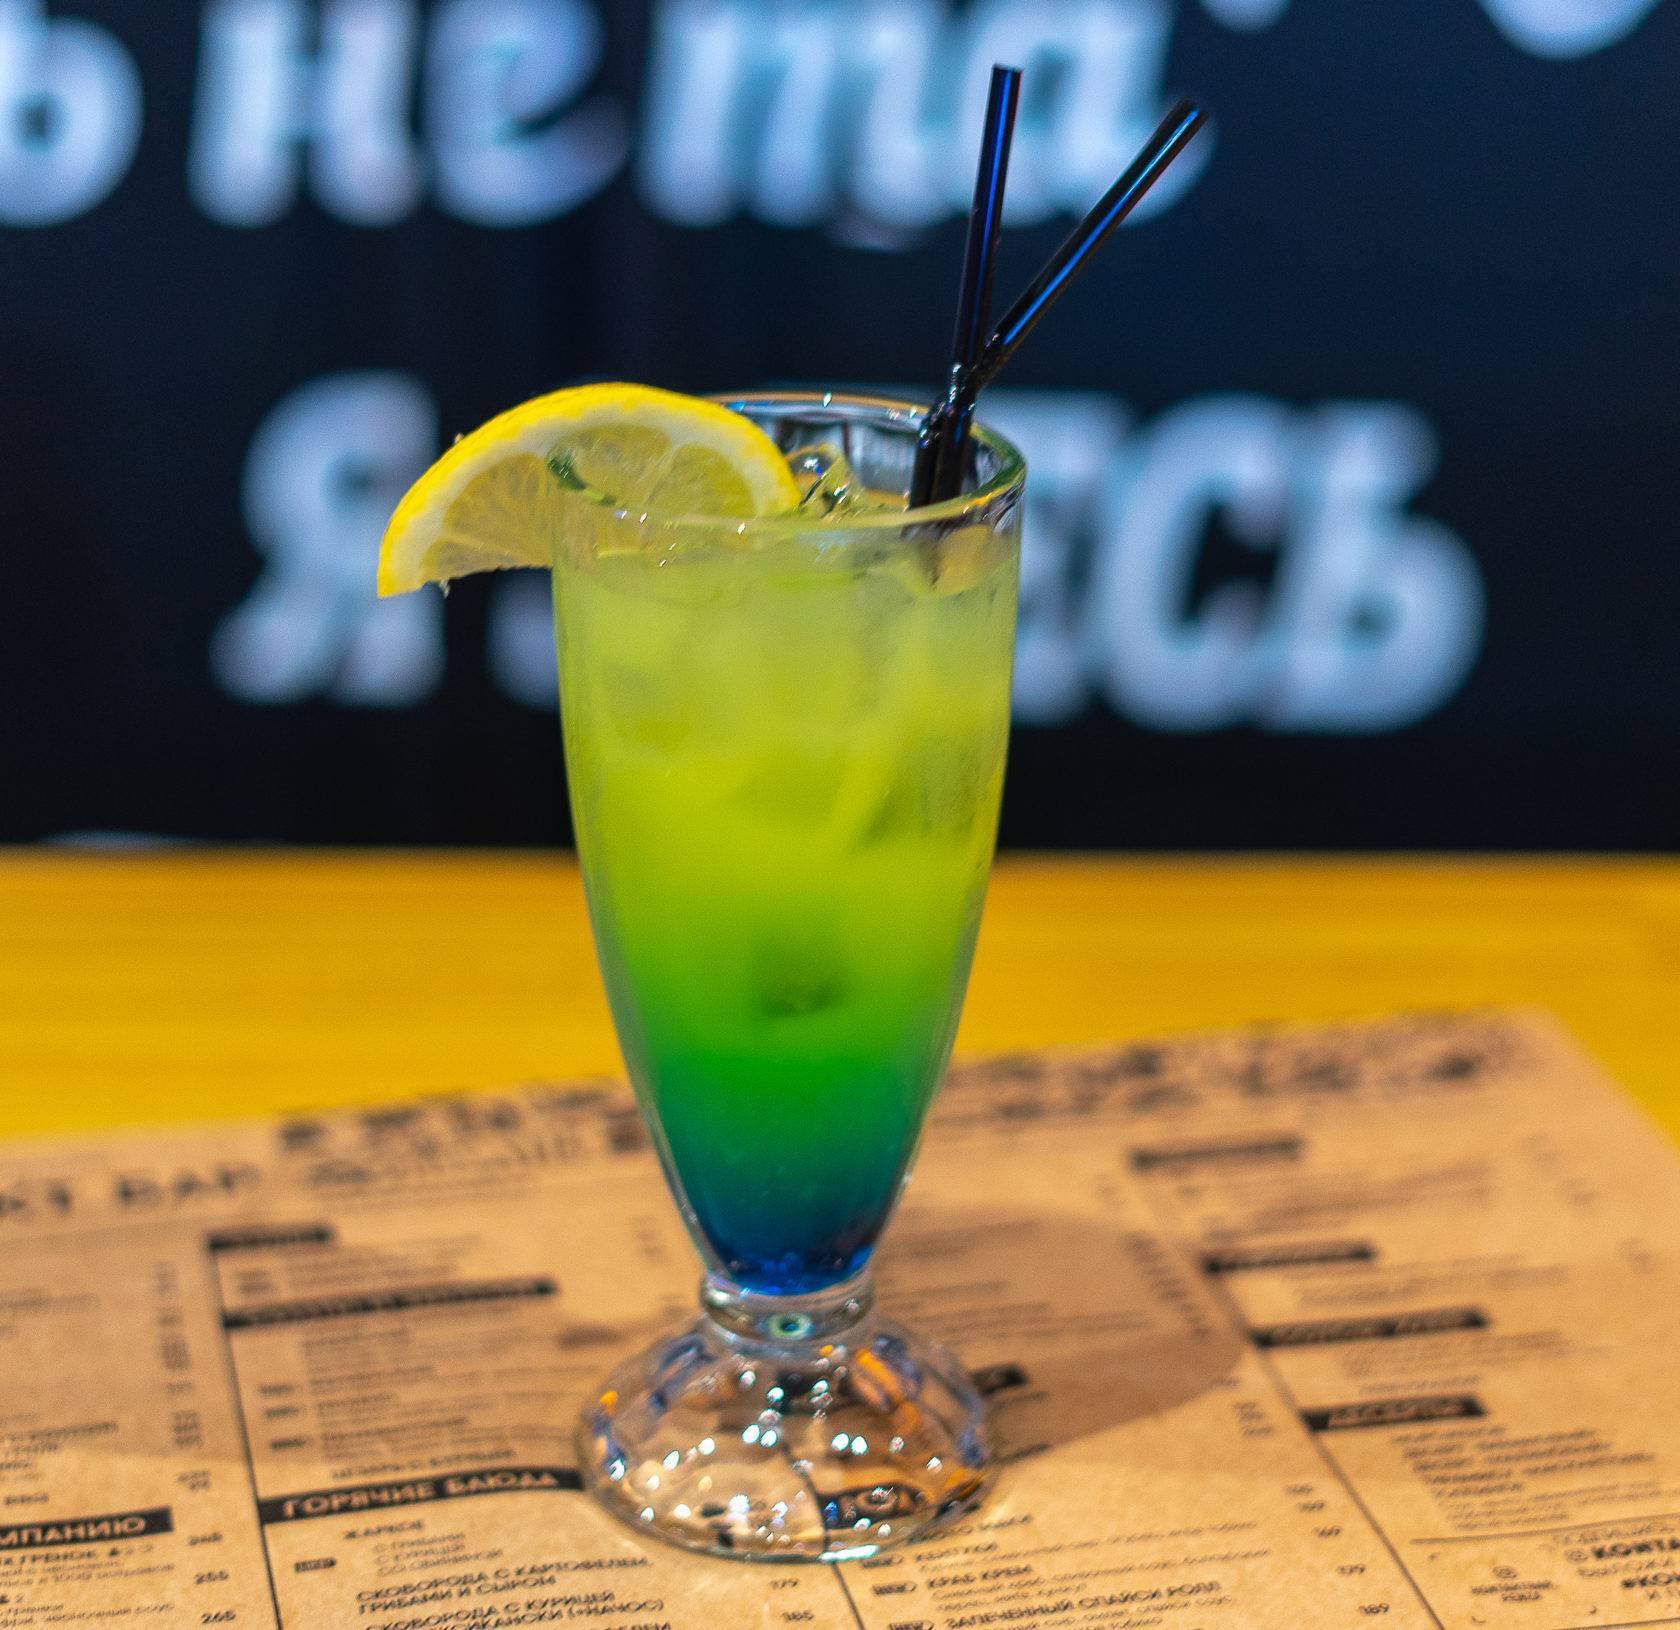 Зеленая фея — коктейль для гурманов: рецепты на основе абсента